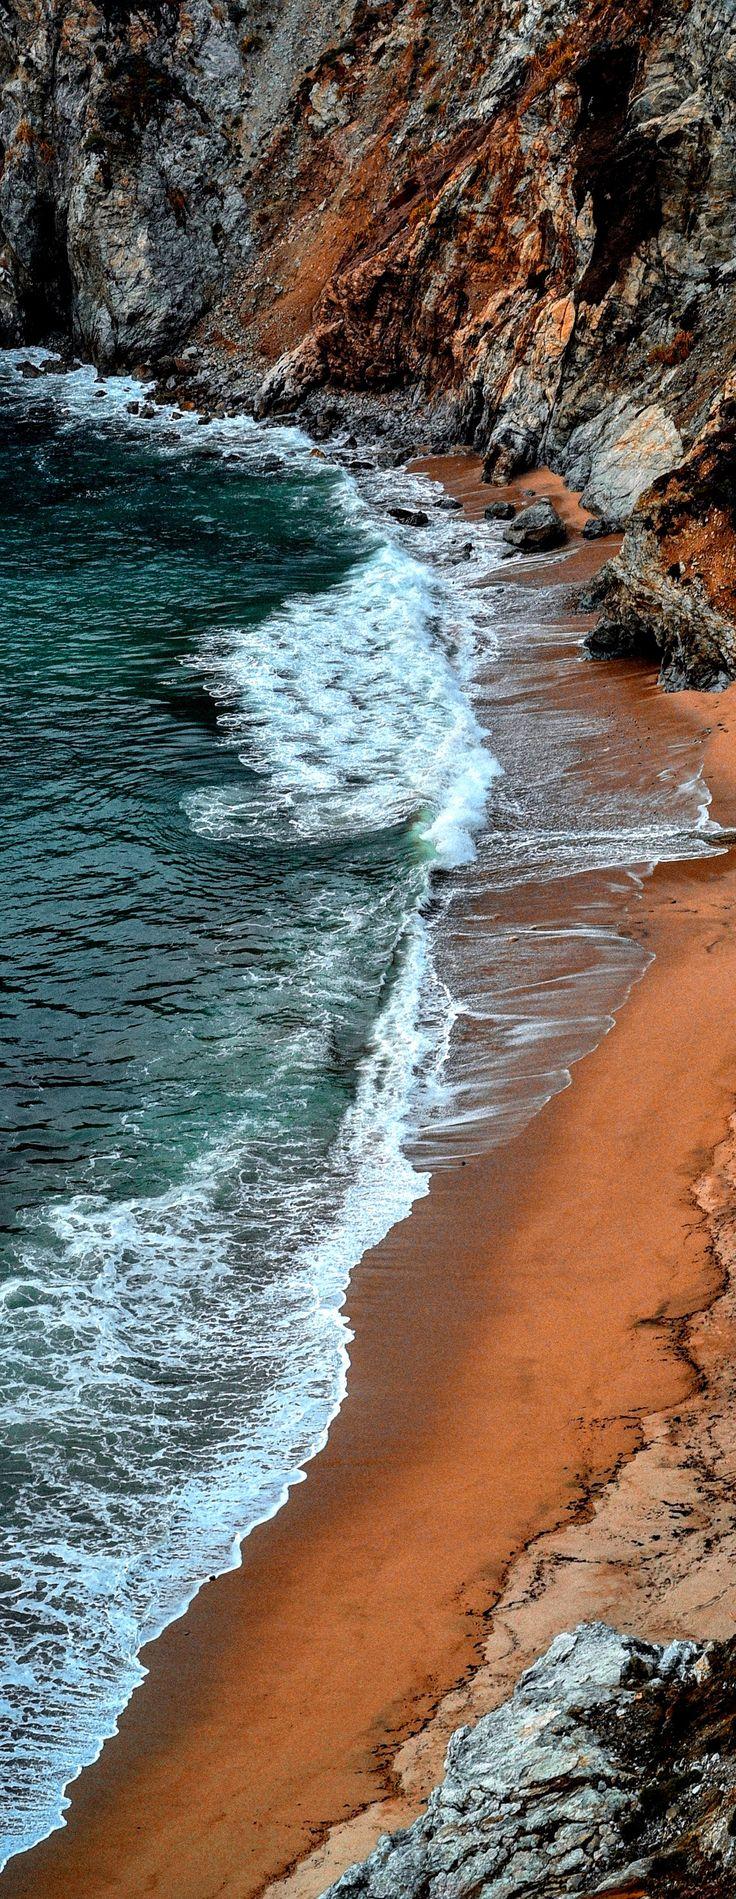 10 Best Beaches Near Houston To Enjoy The Sun, Sand, And